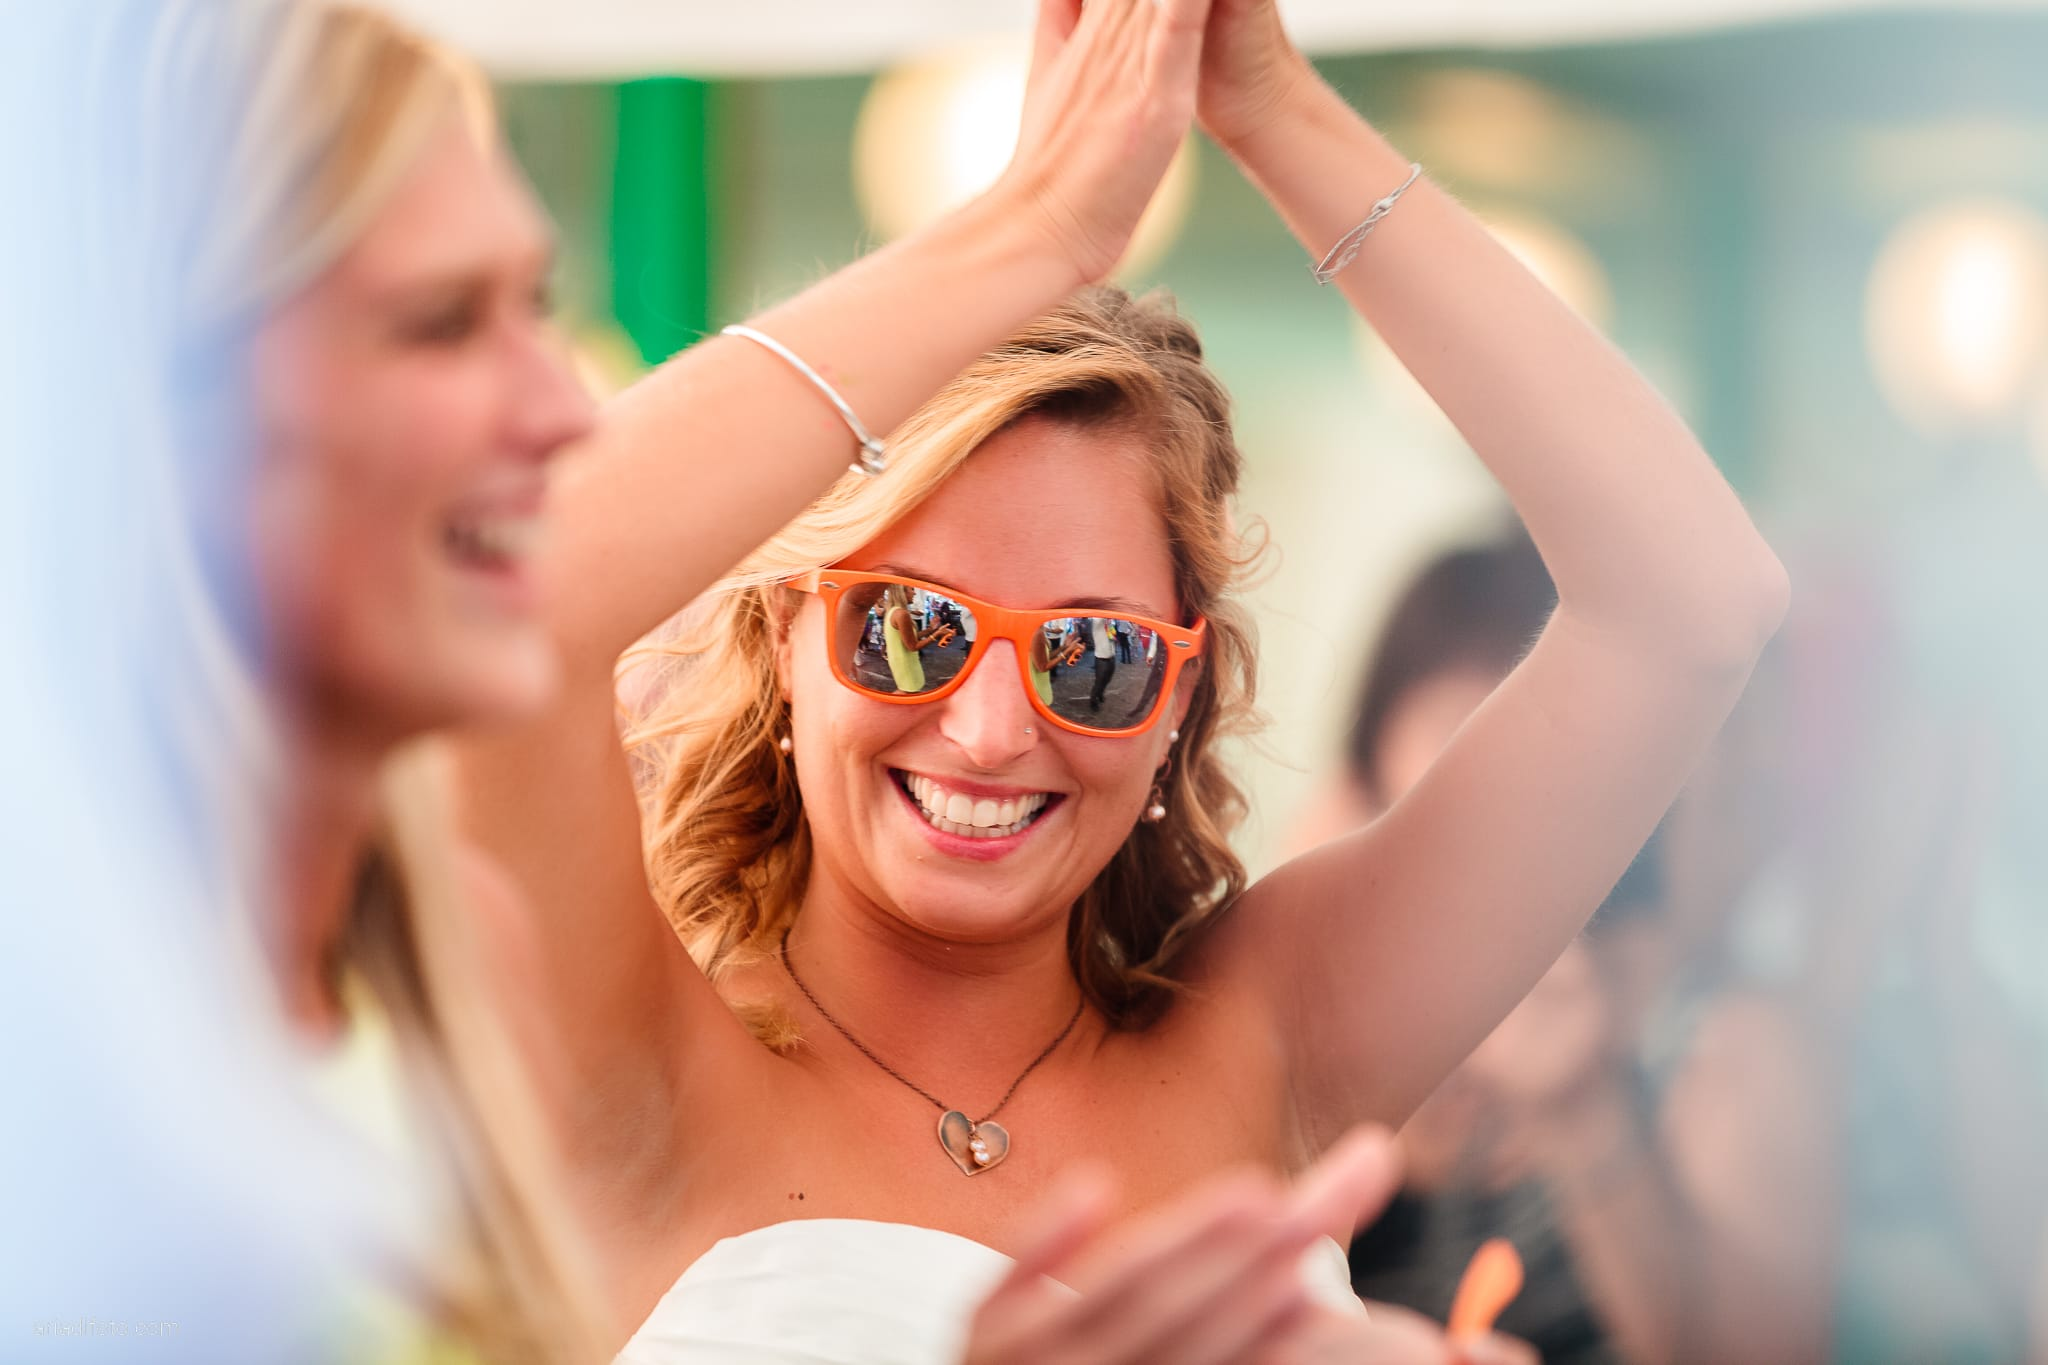 Sara Marco matrimonio Grado campeggio Punta Spin Gorizia ricevimento festa balli amici